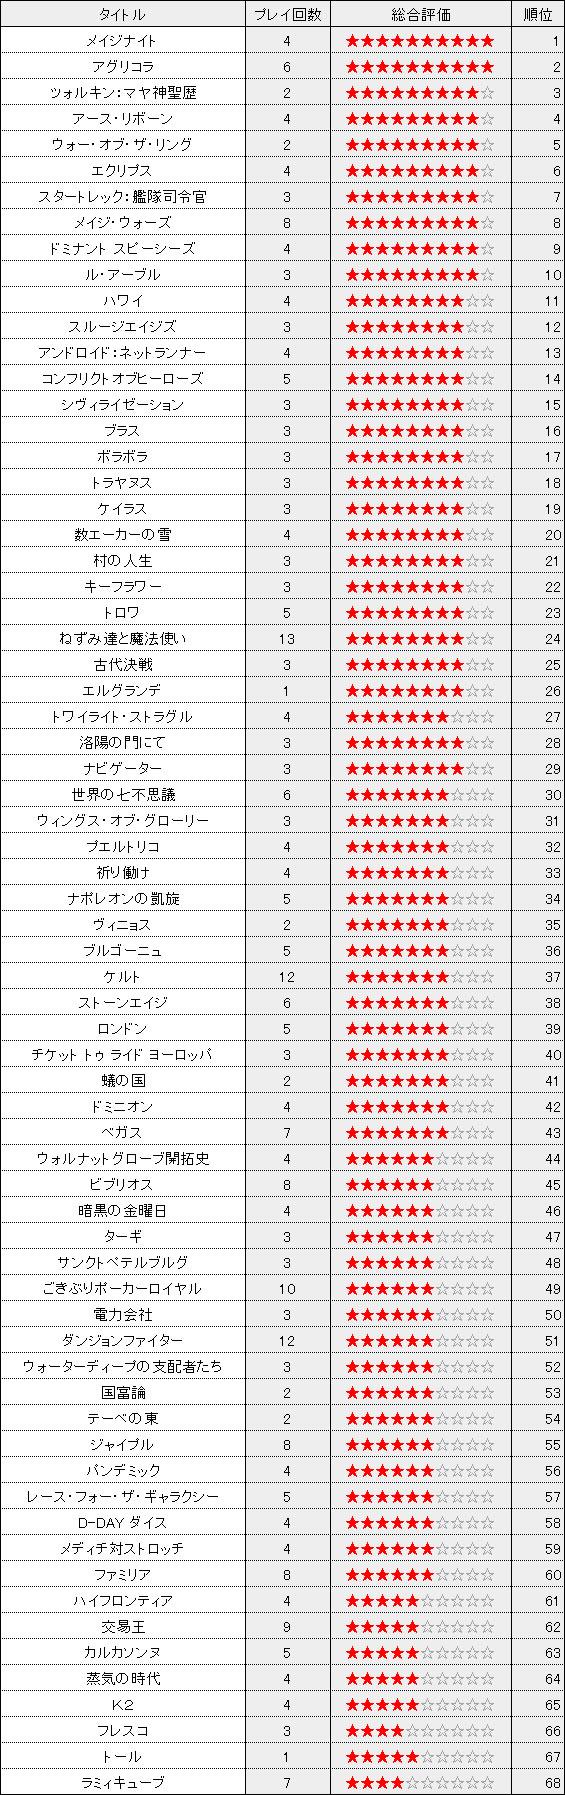 ranking130501.jpg